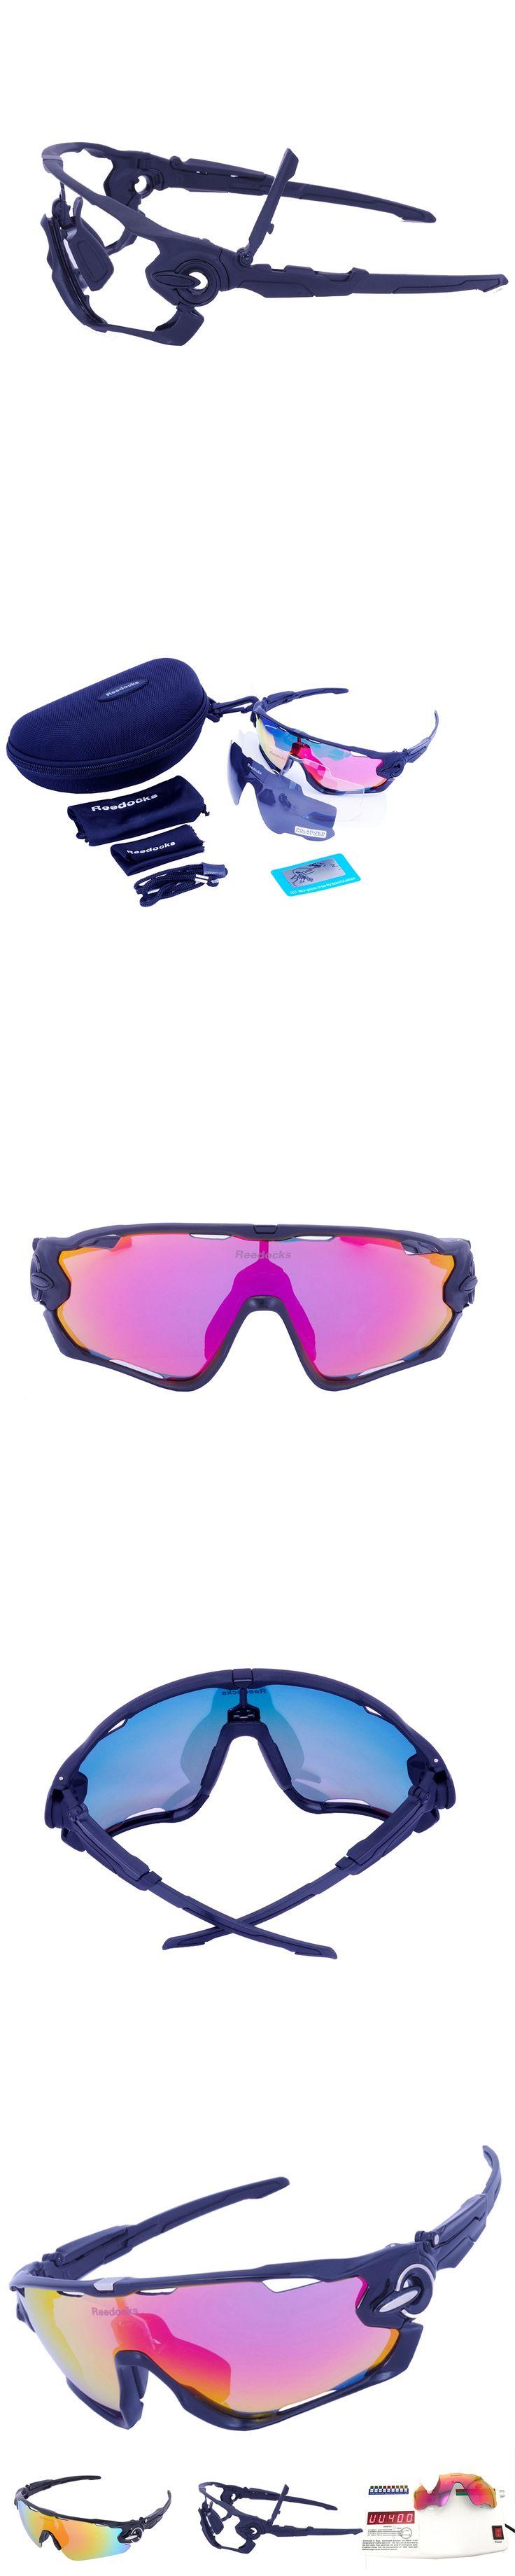 SALE ! 3 Lens Mens Polarized Brand Cycling Glasses Mountain Bike Goggles Sport MTB Eyewear Bicycle Sunglasses Tour De France